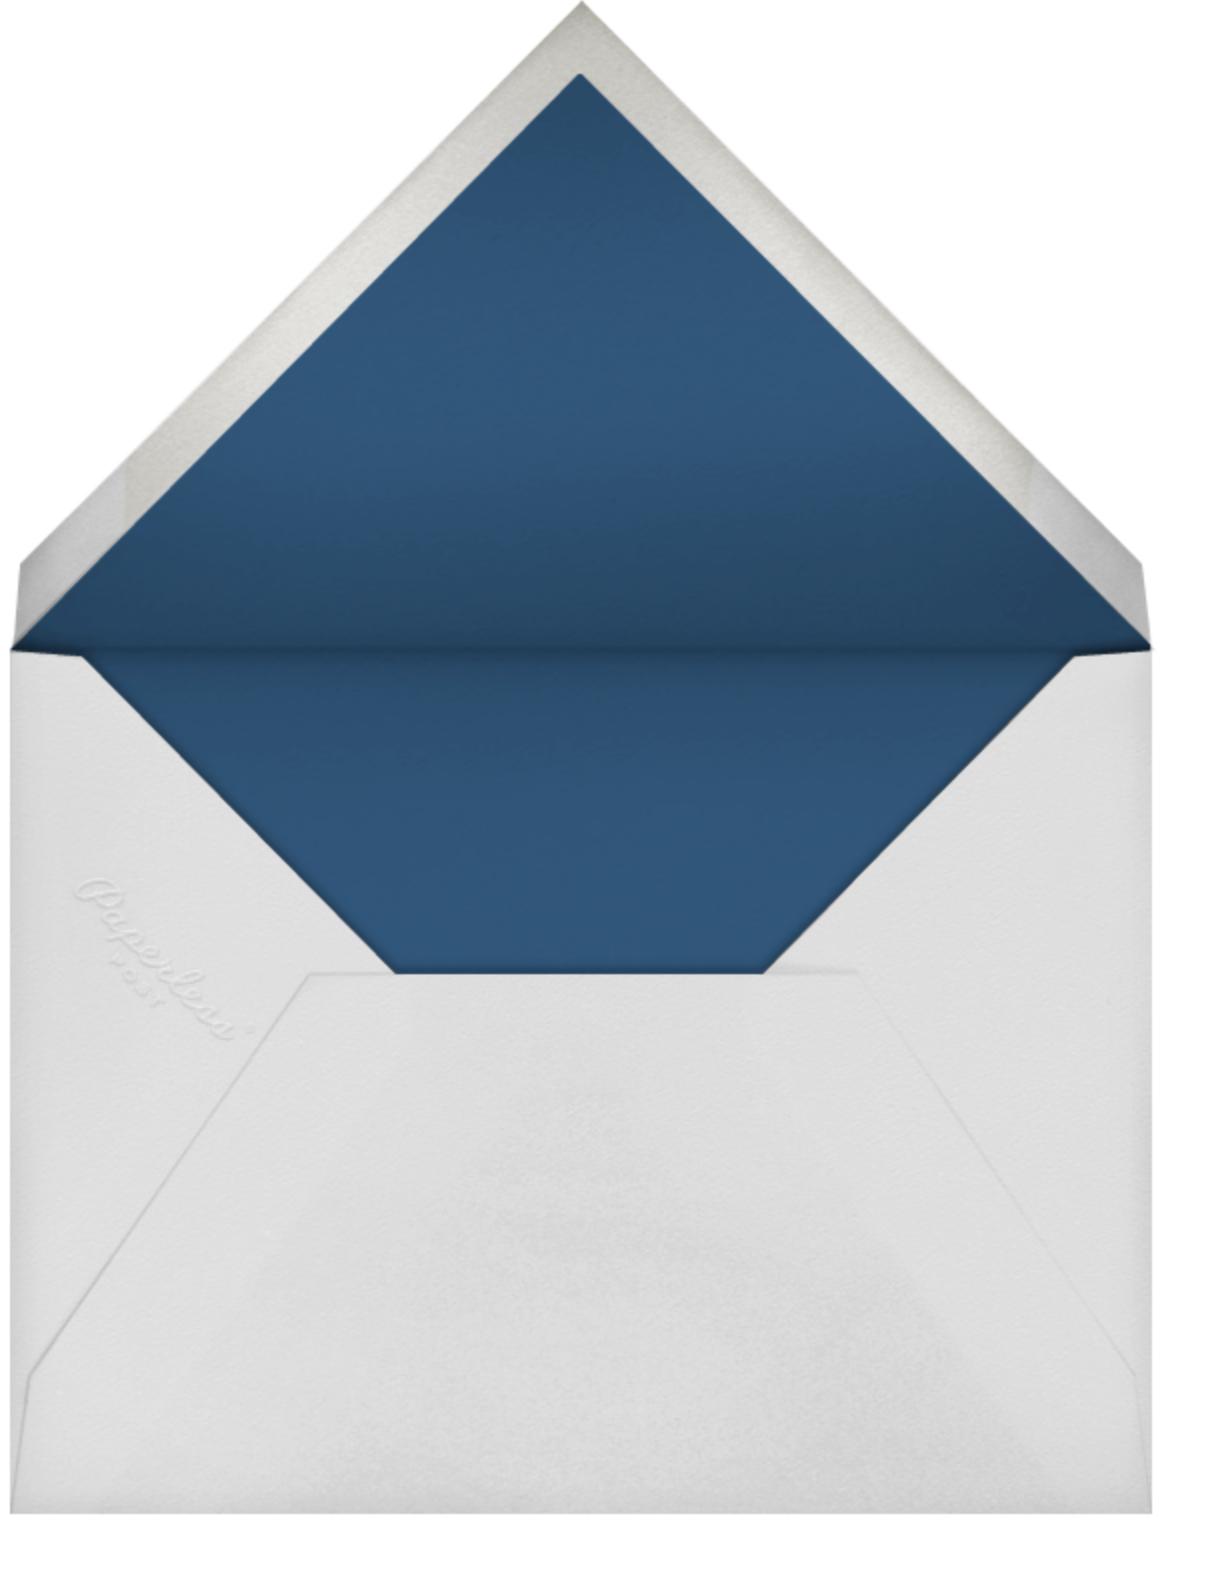 Gardenia - White/Silver - Oscar de la Renta - Anniversary party - envelope back